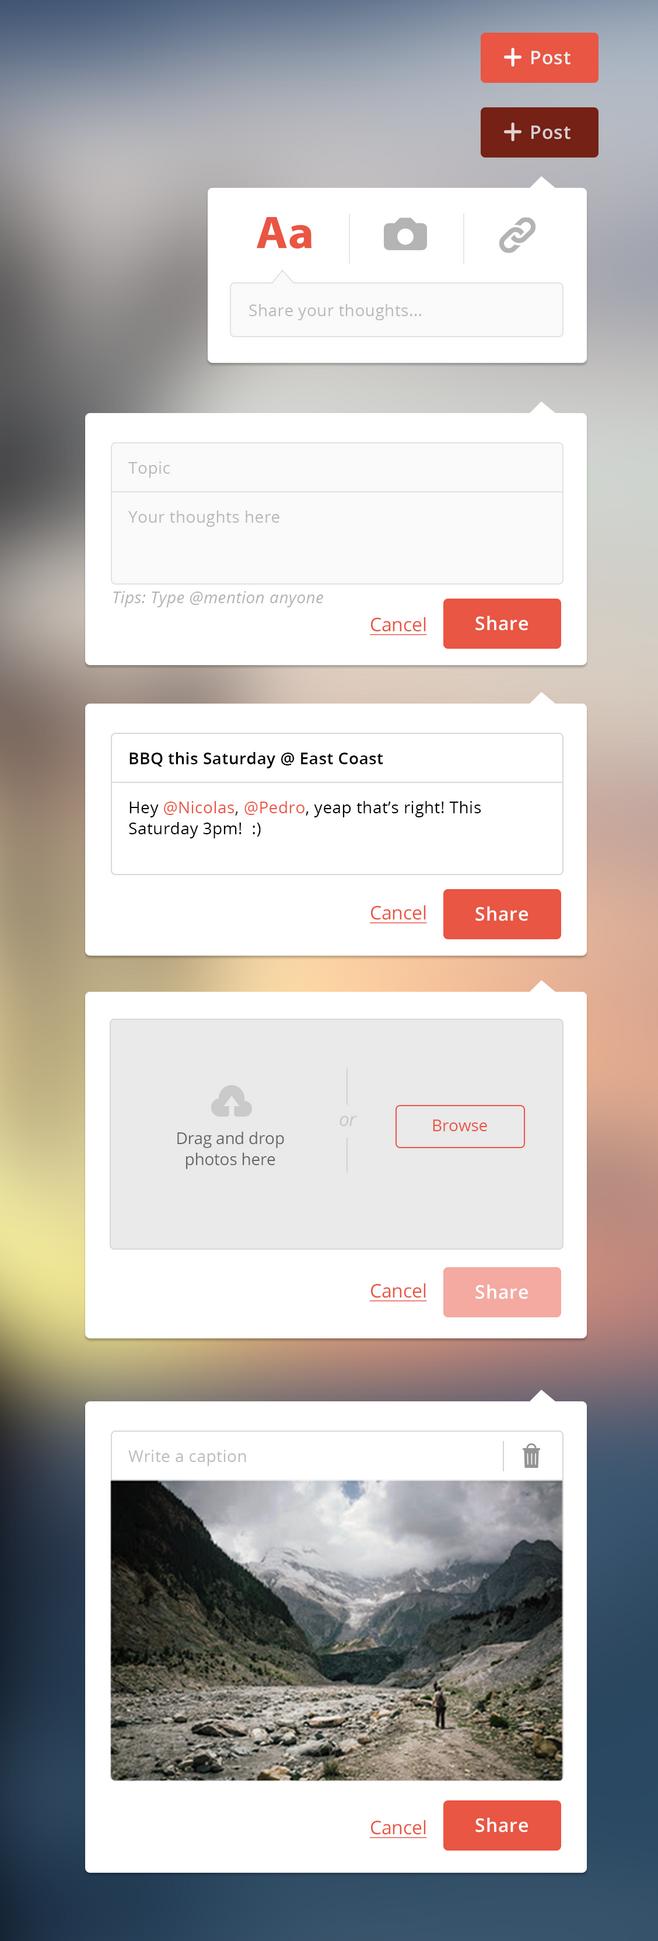 app表单设计